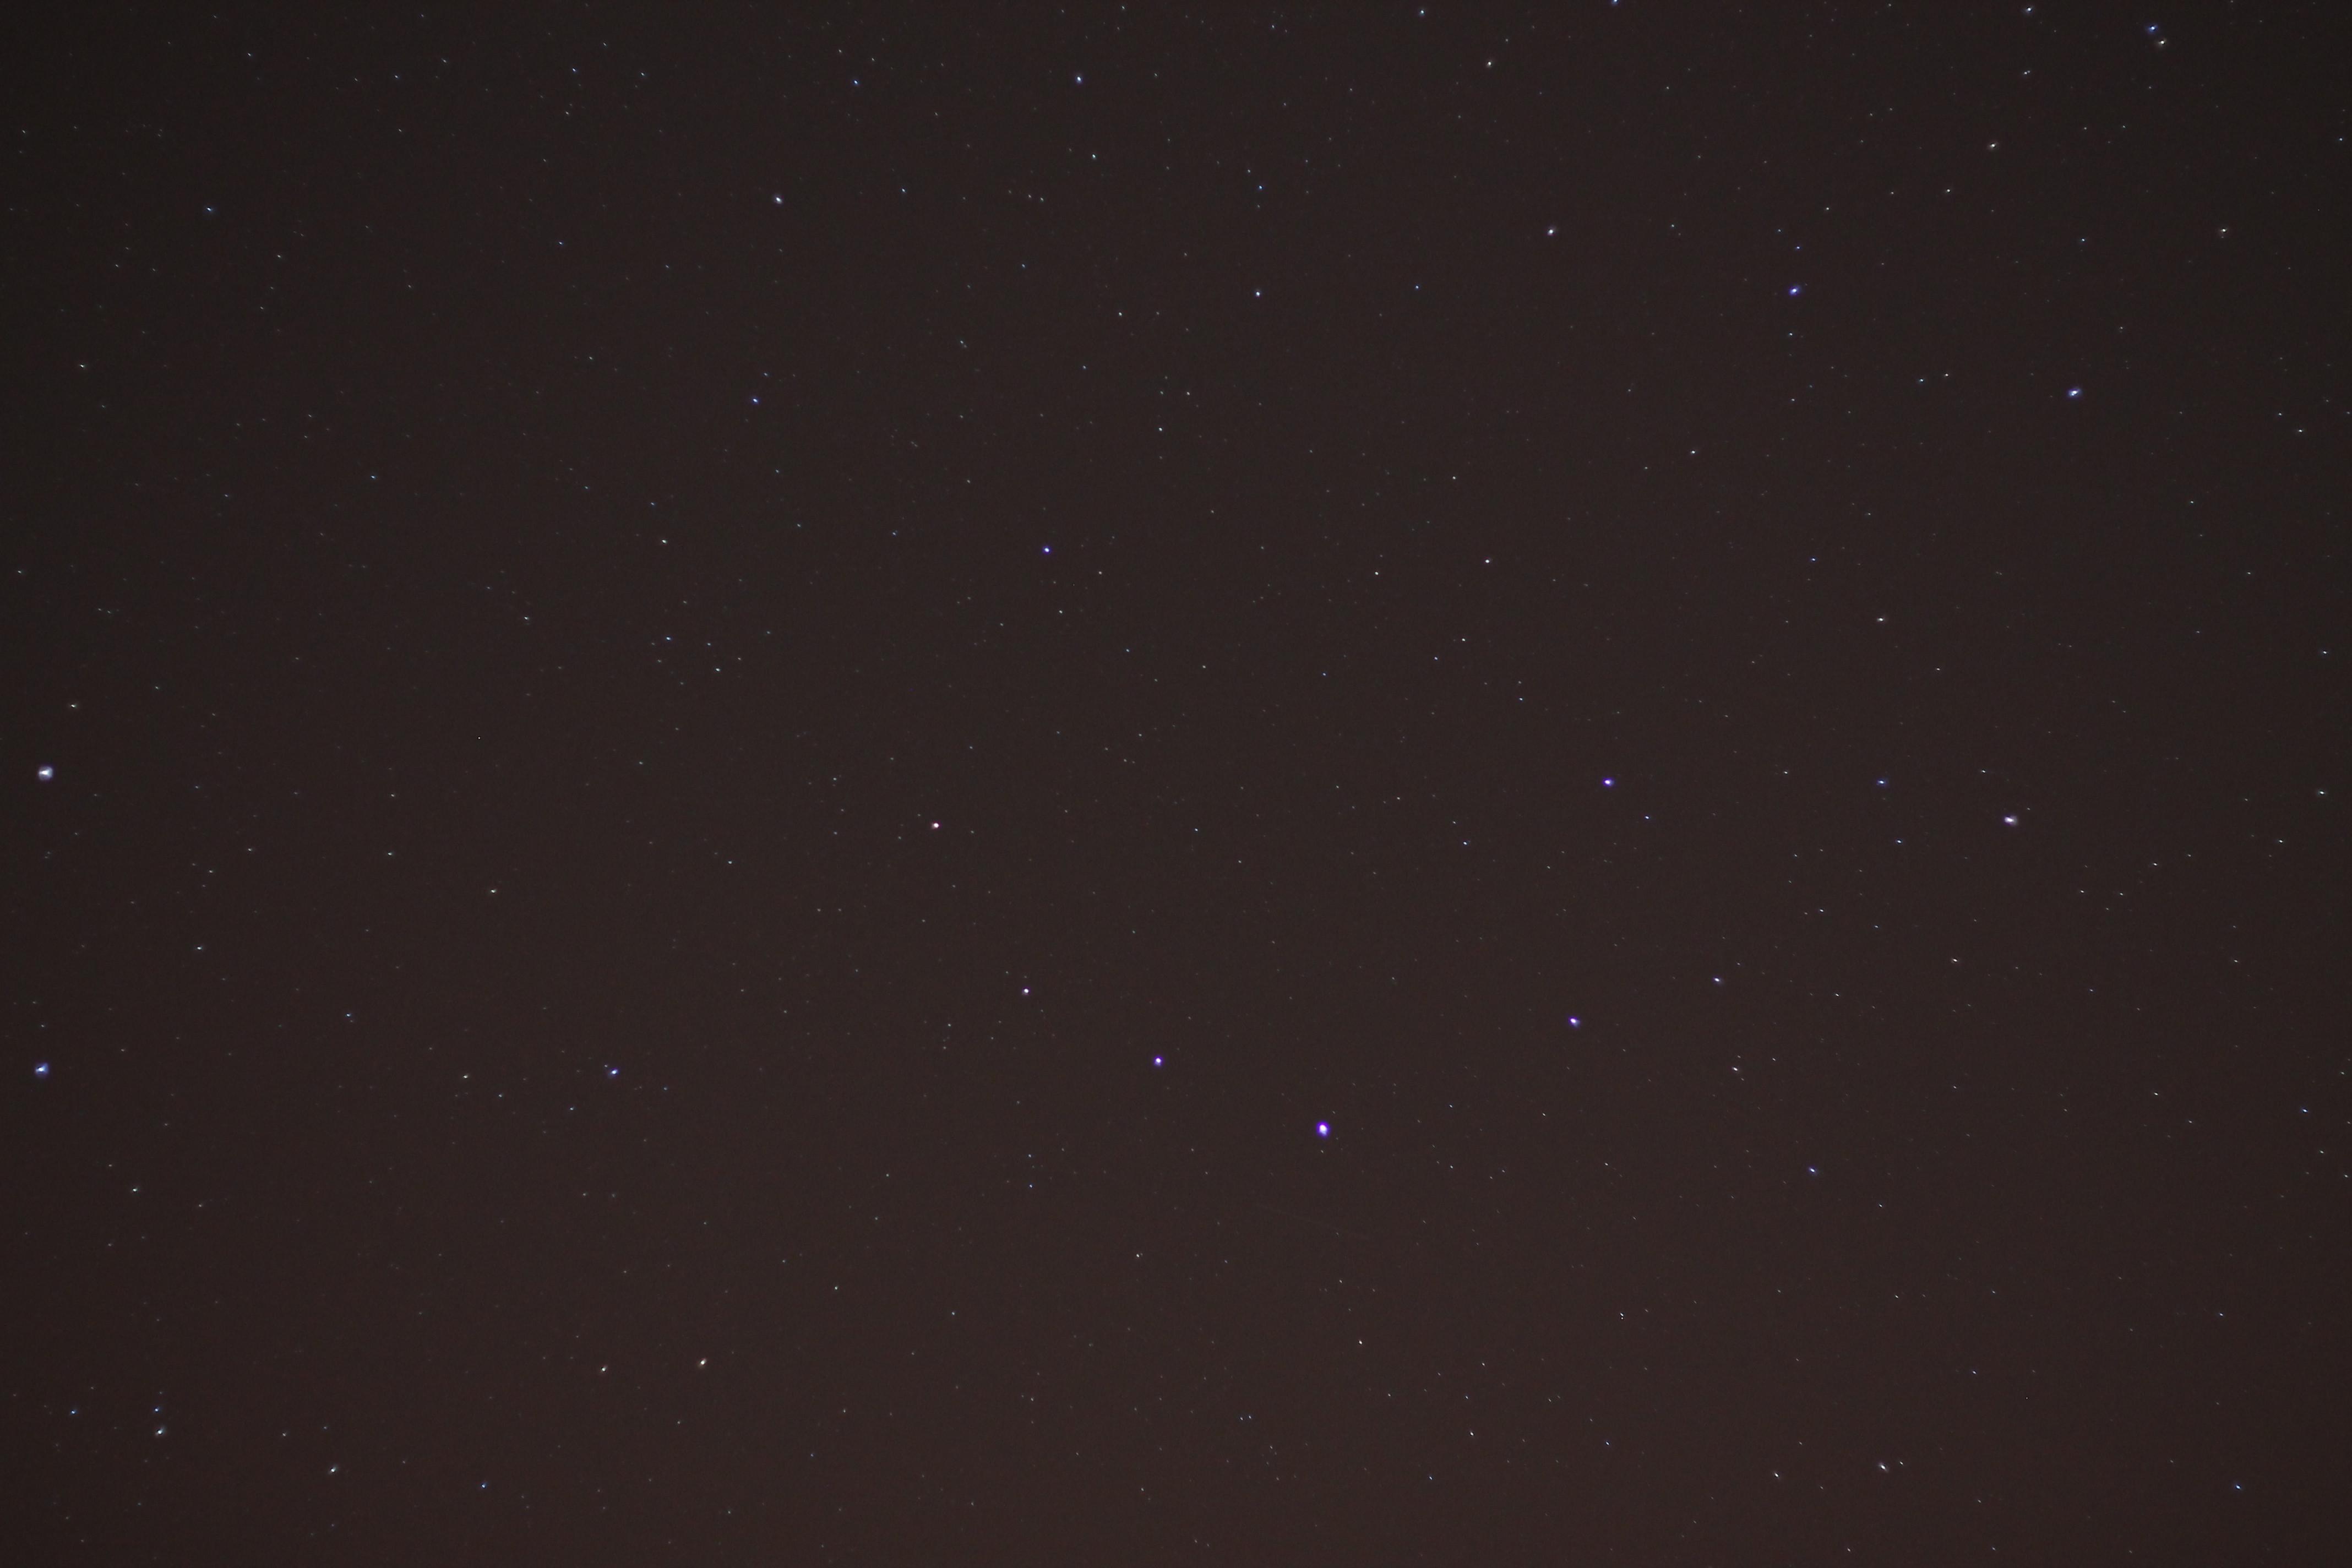 Corona Borealis Constellation